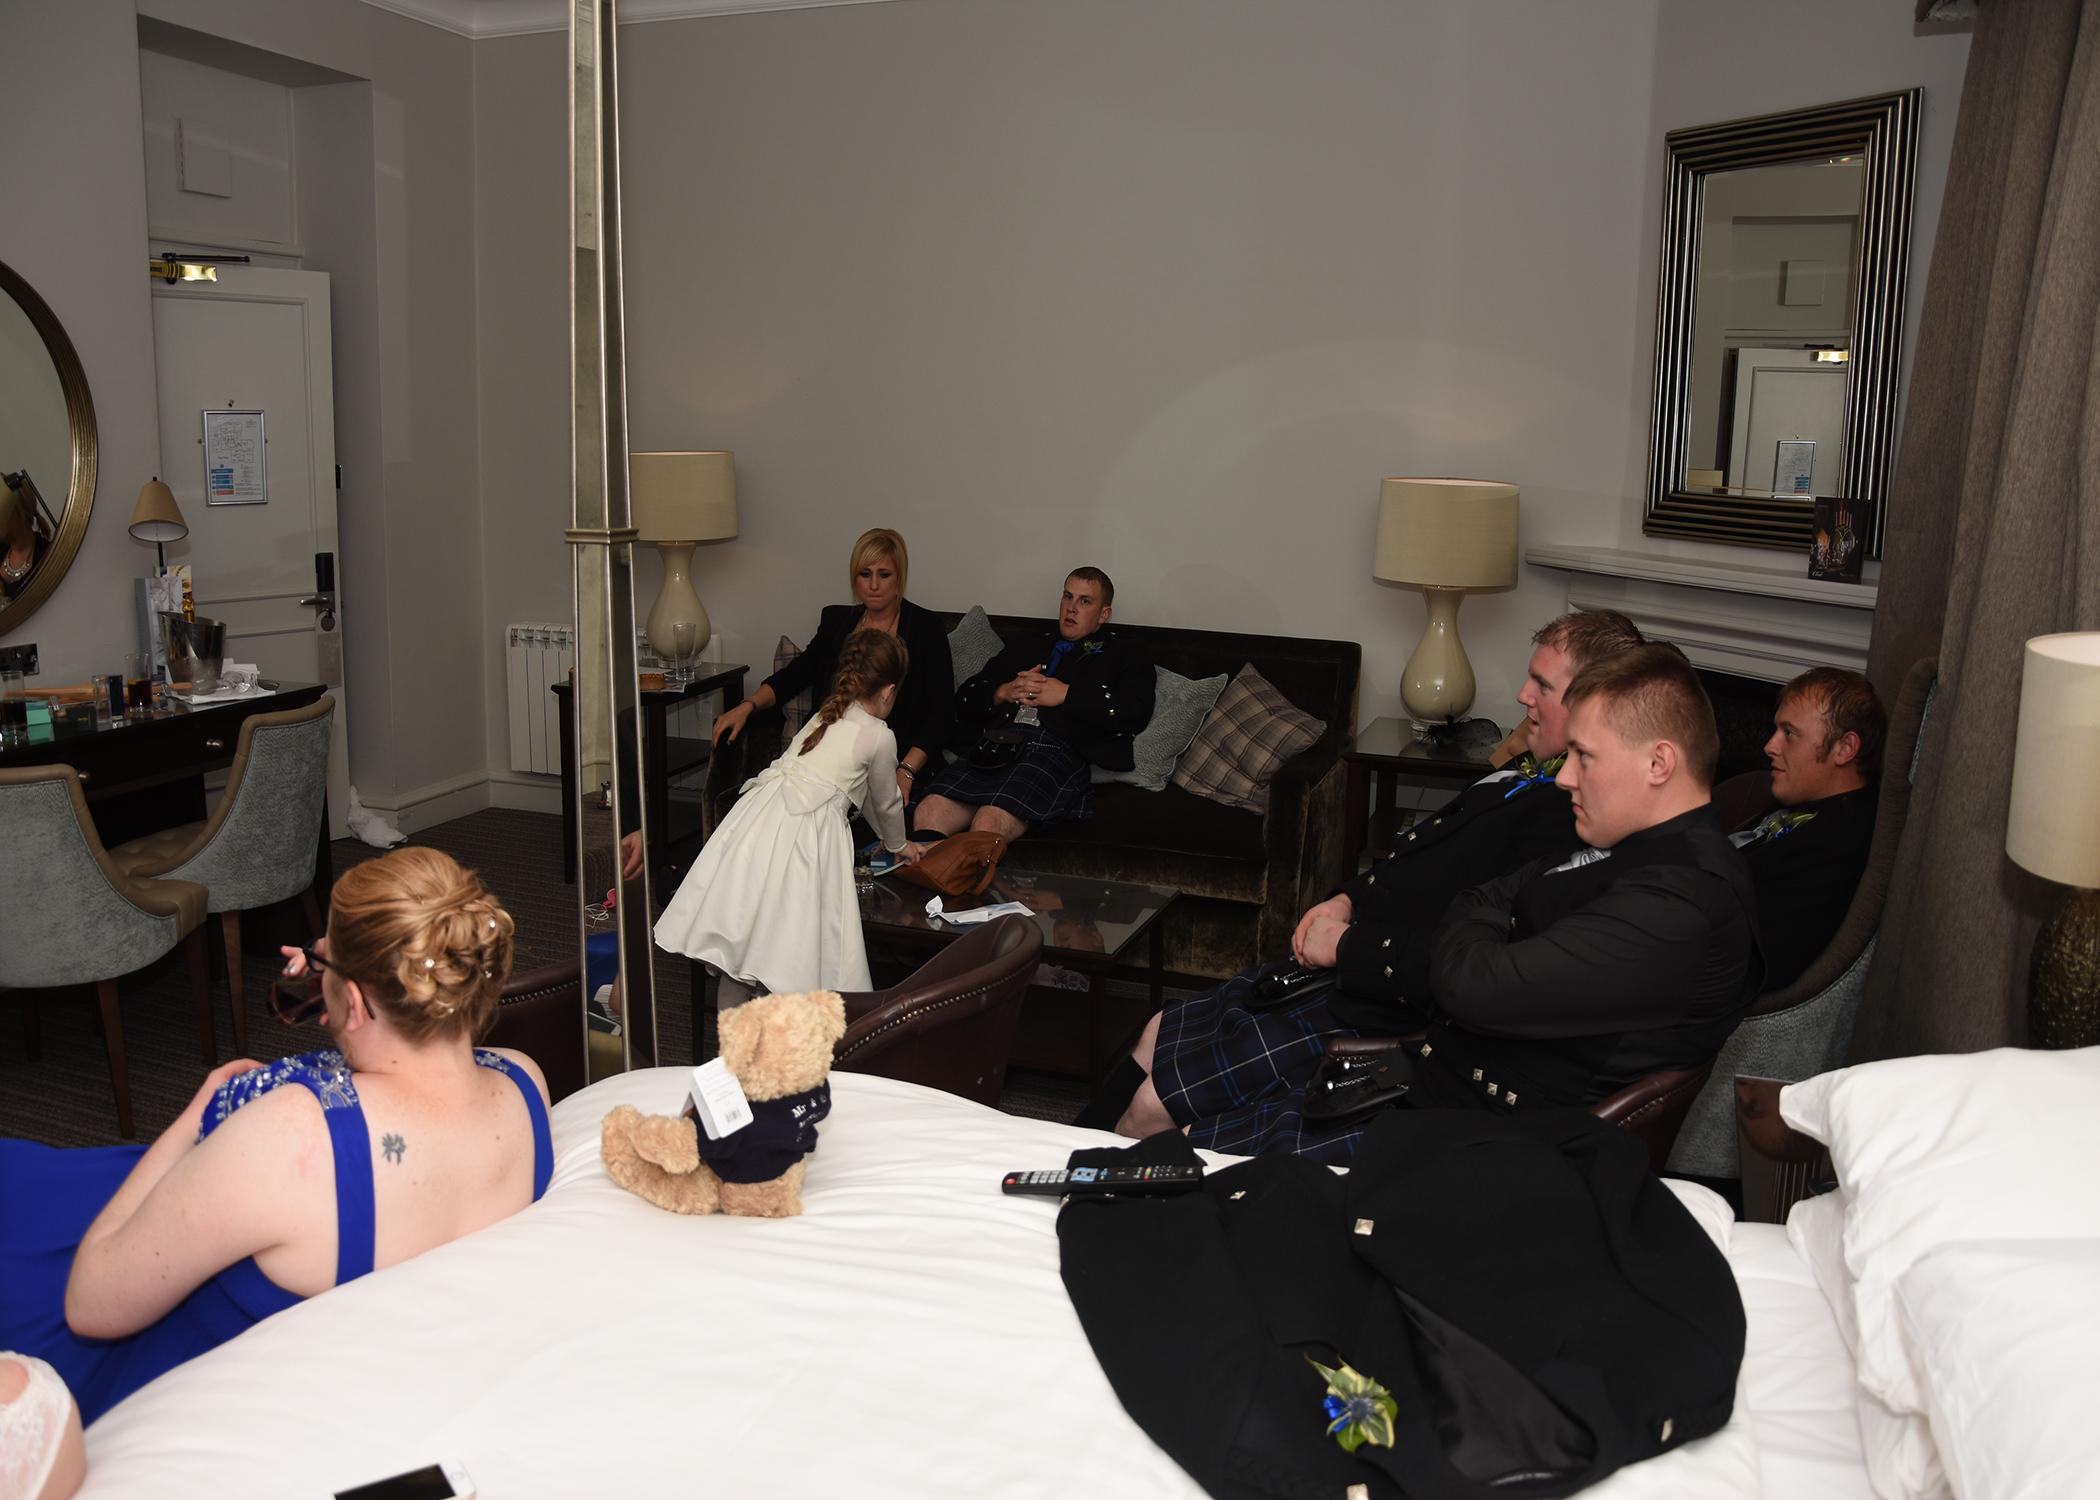 Leanne and Stuart McSherry' wedding (Darren Wyllie Photography)